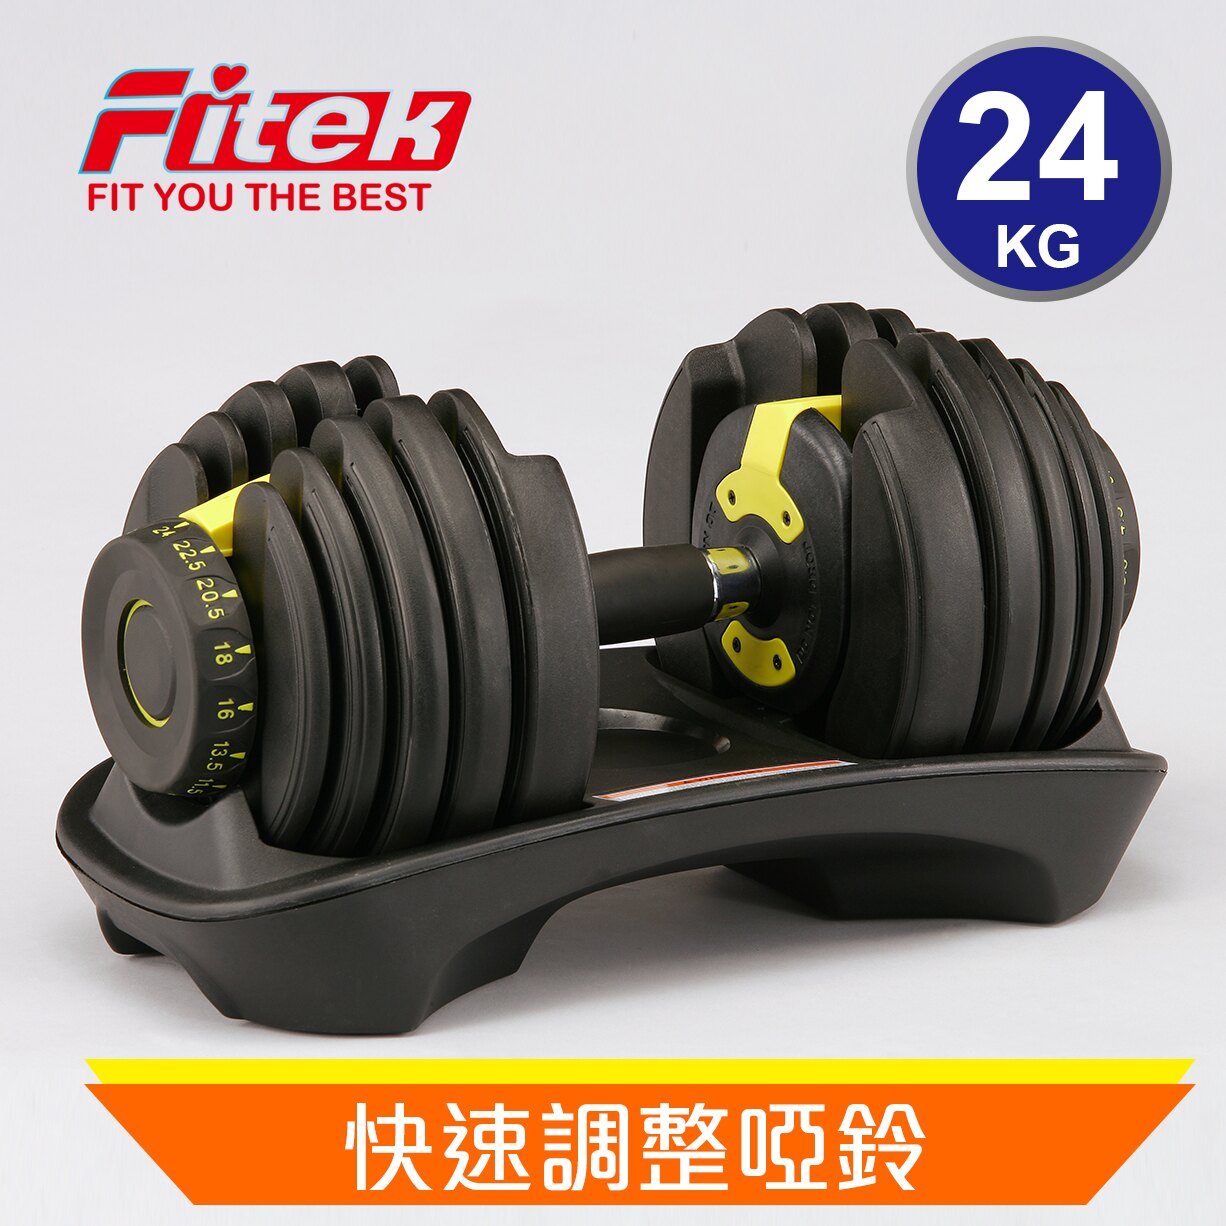 【Fitek健身網】24KG快速調整啞鈴 24公斤槓鈴 15段重量可調 重訓 舉重訓練 組合式槓片槓鈴短槓